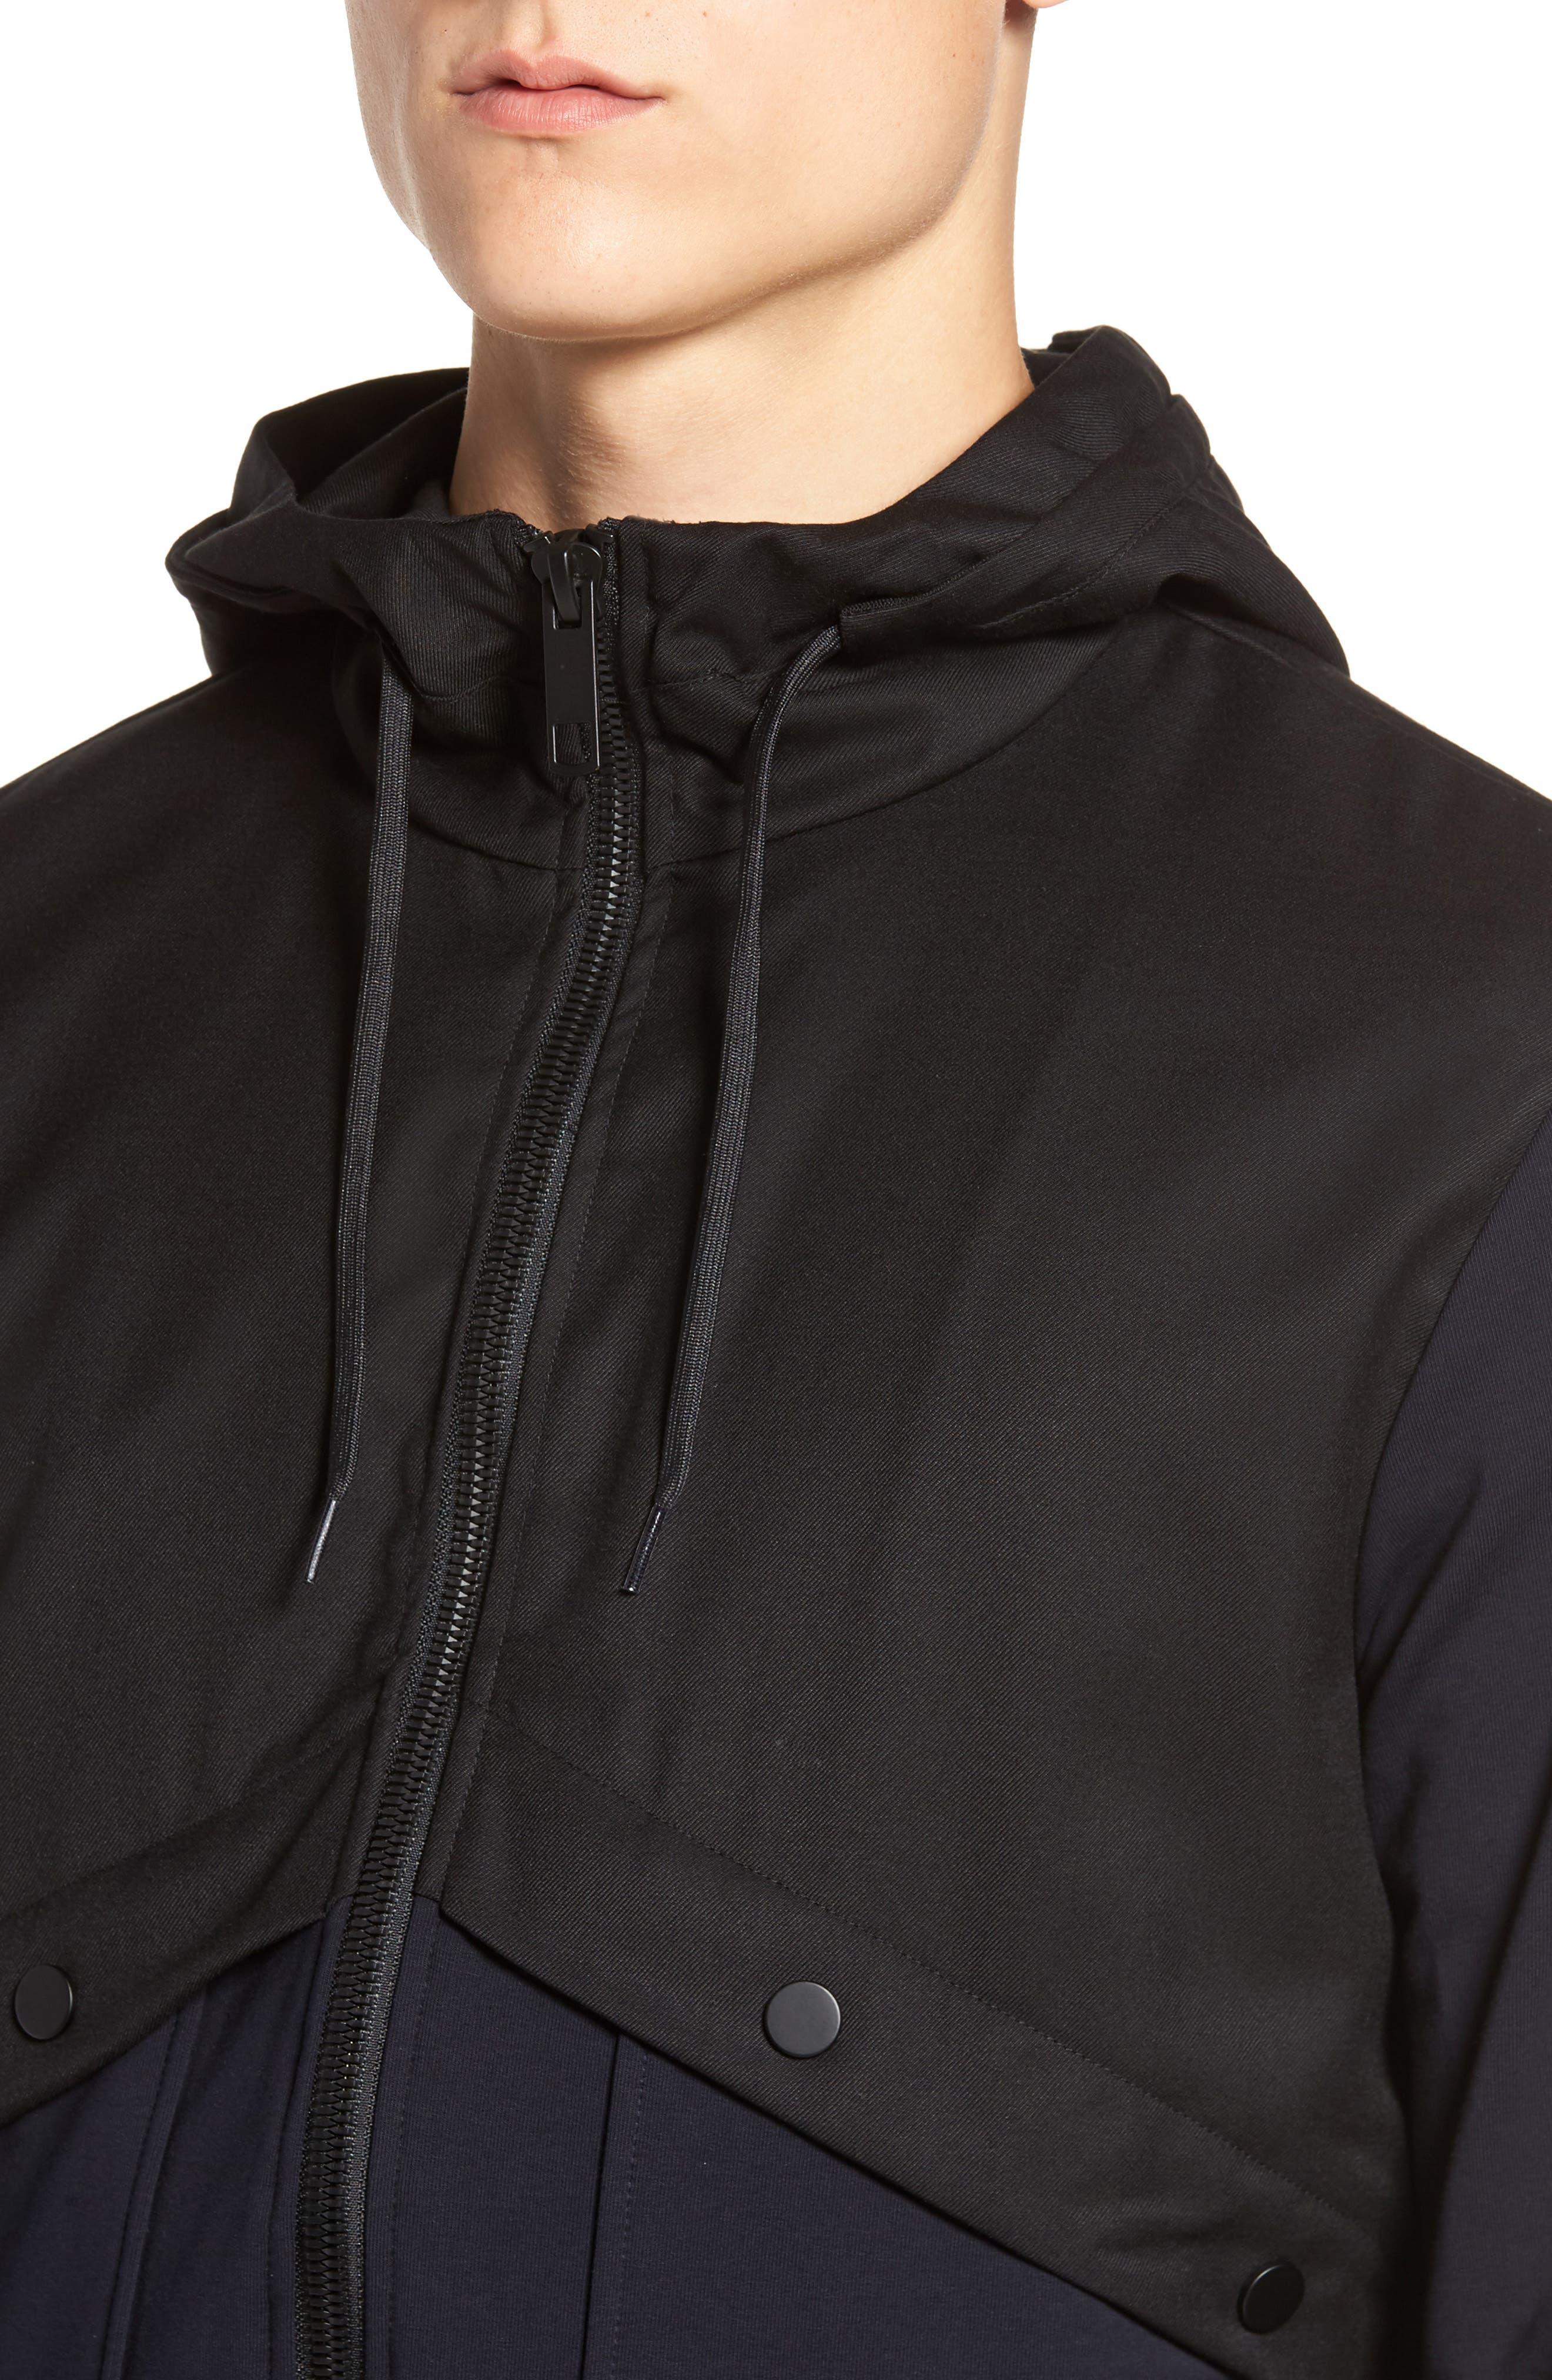 Fleece Zip Up Jacket,                             Alternate thumbnail 4, color,                             Black